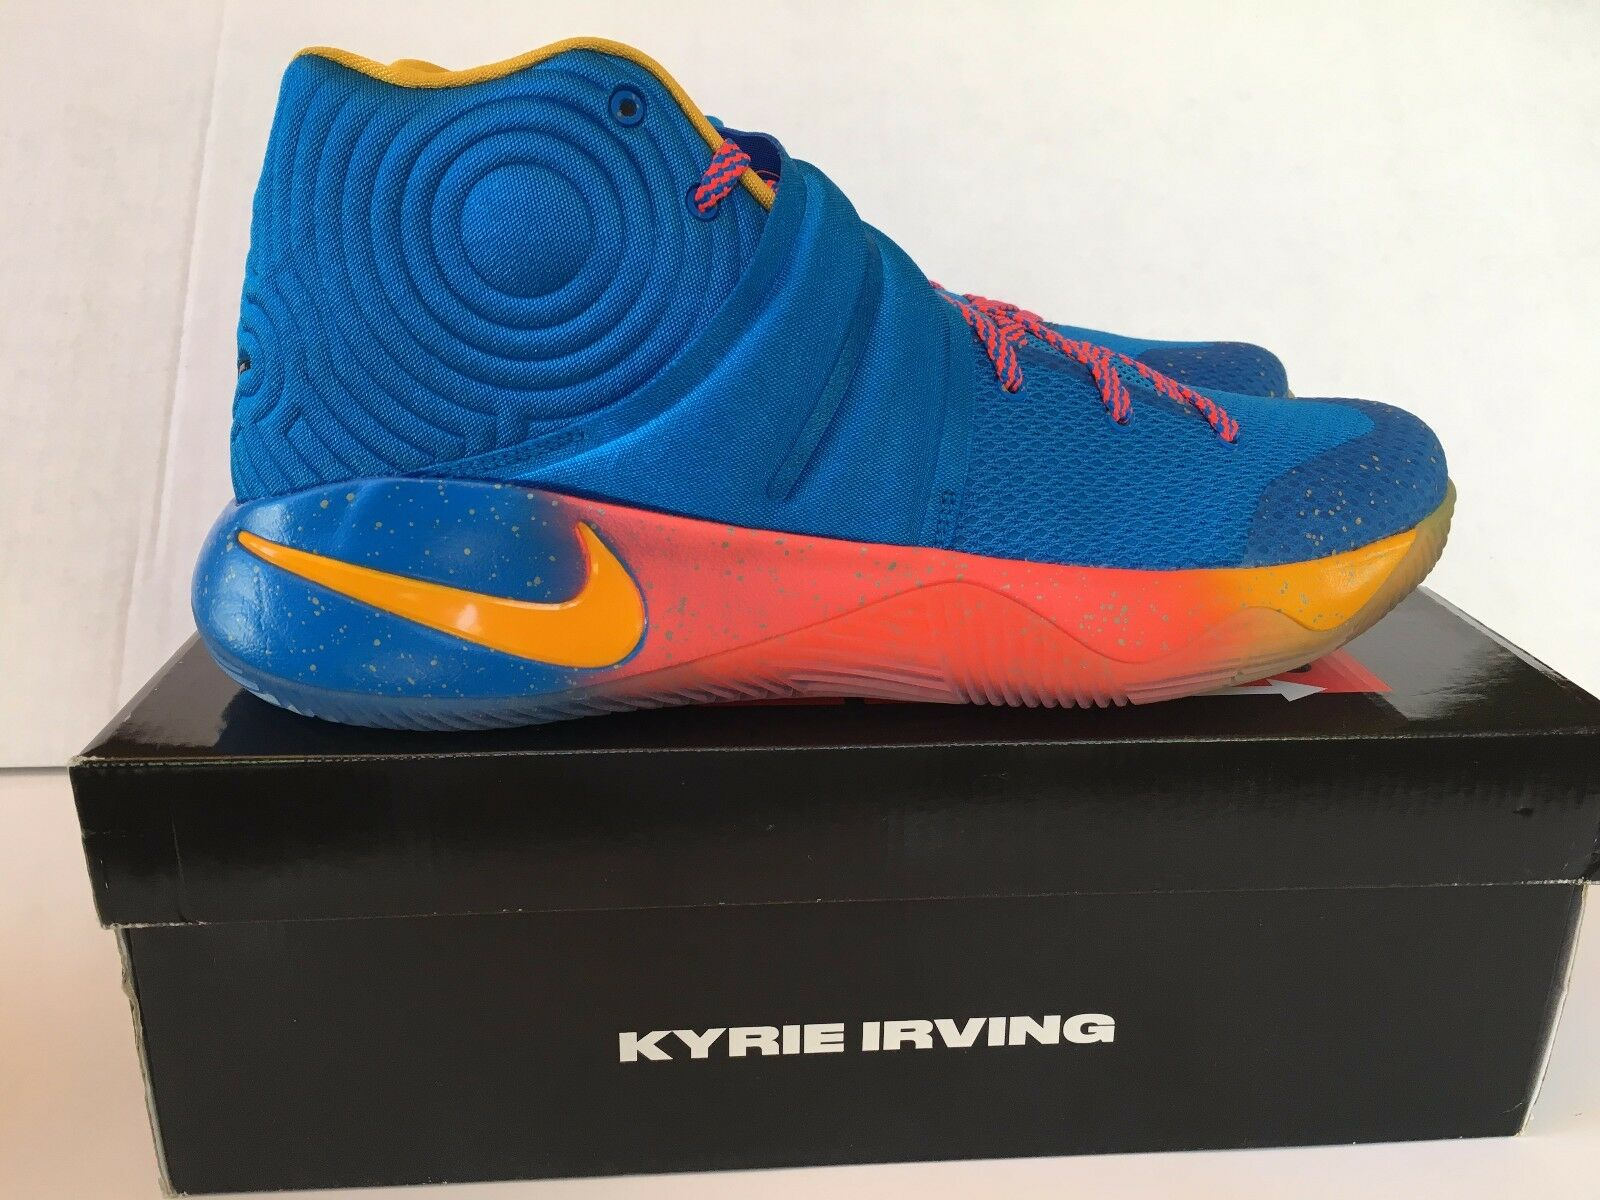 Nike kyrie 2 promo eybl - dimensioni nuove 847687-470 oro blu rosso cremisi rari